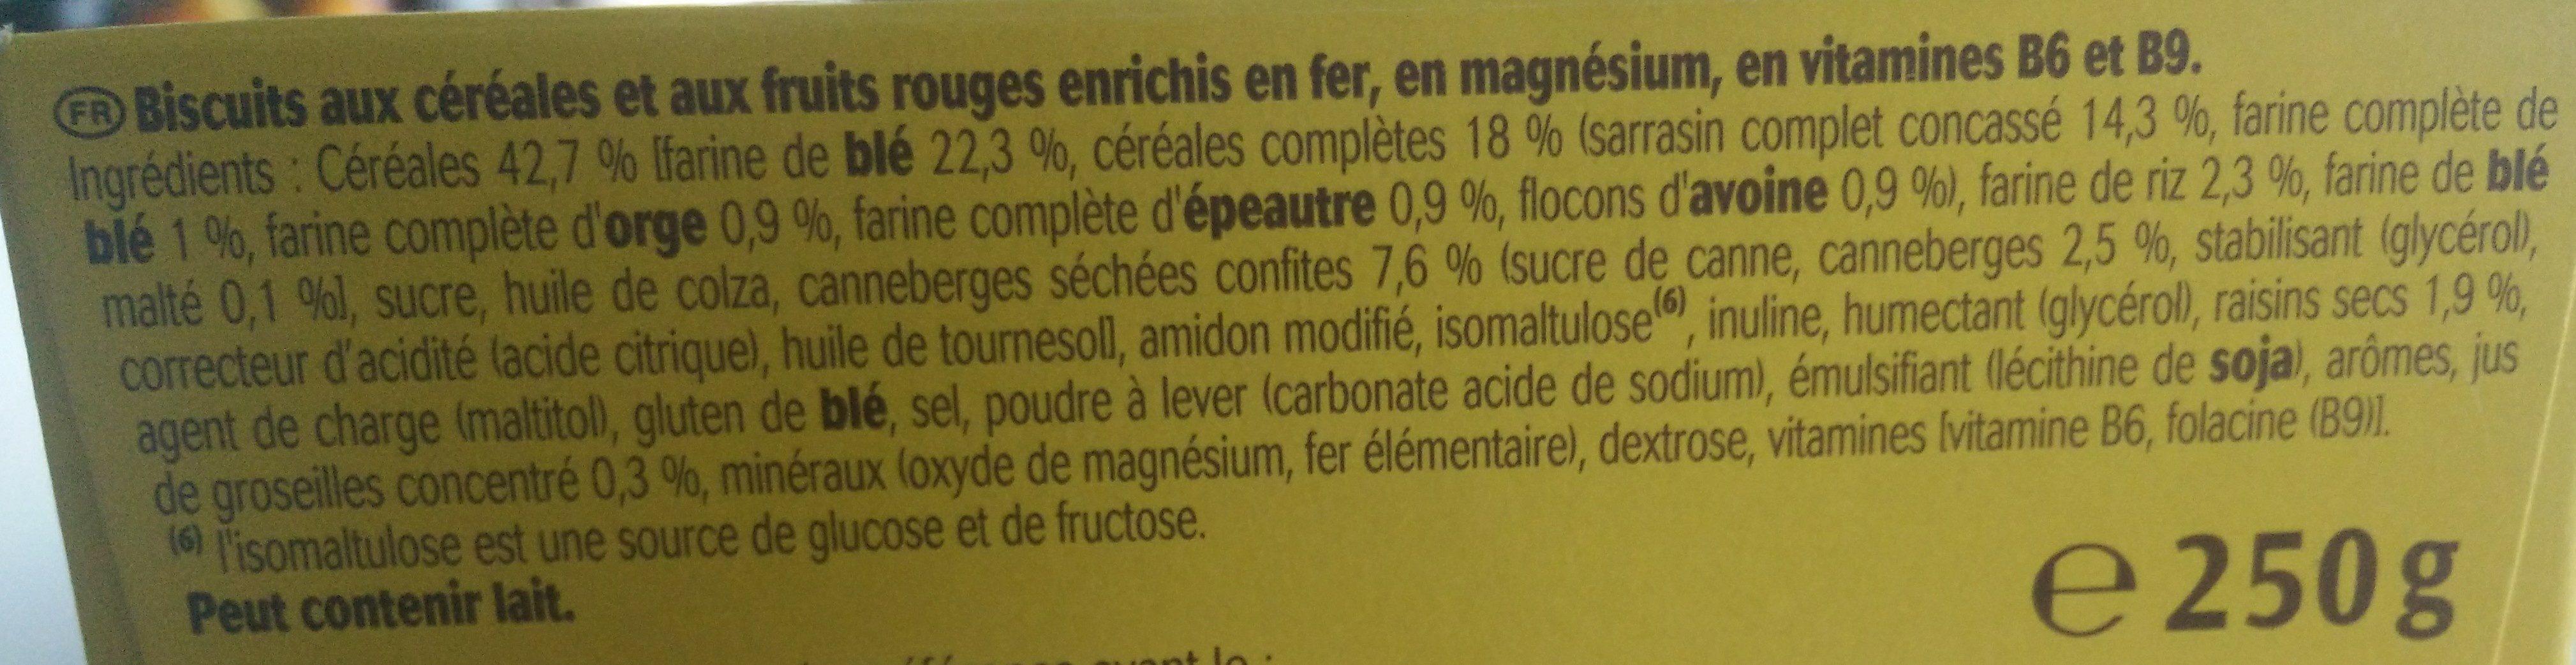 Le Moelleux fruits rouges - Ingredients - fr